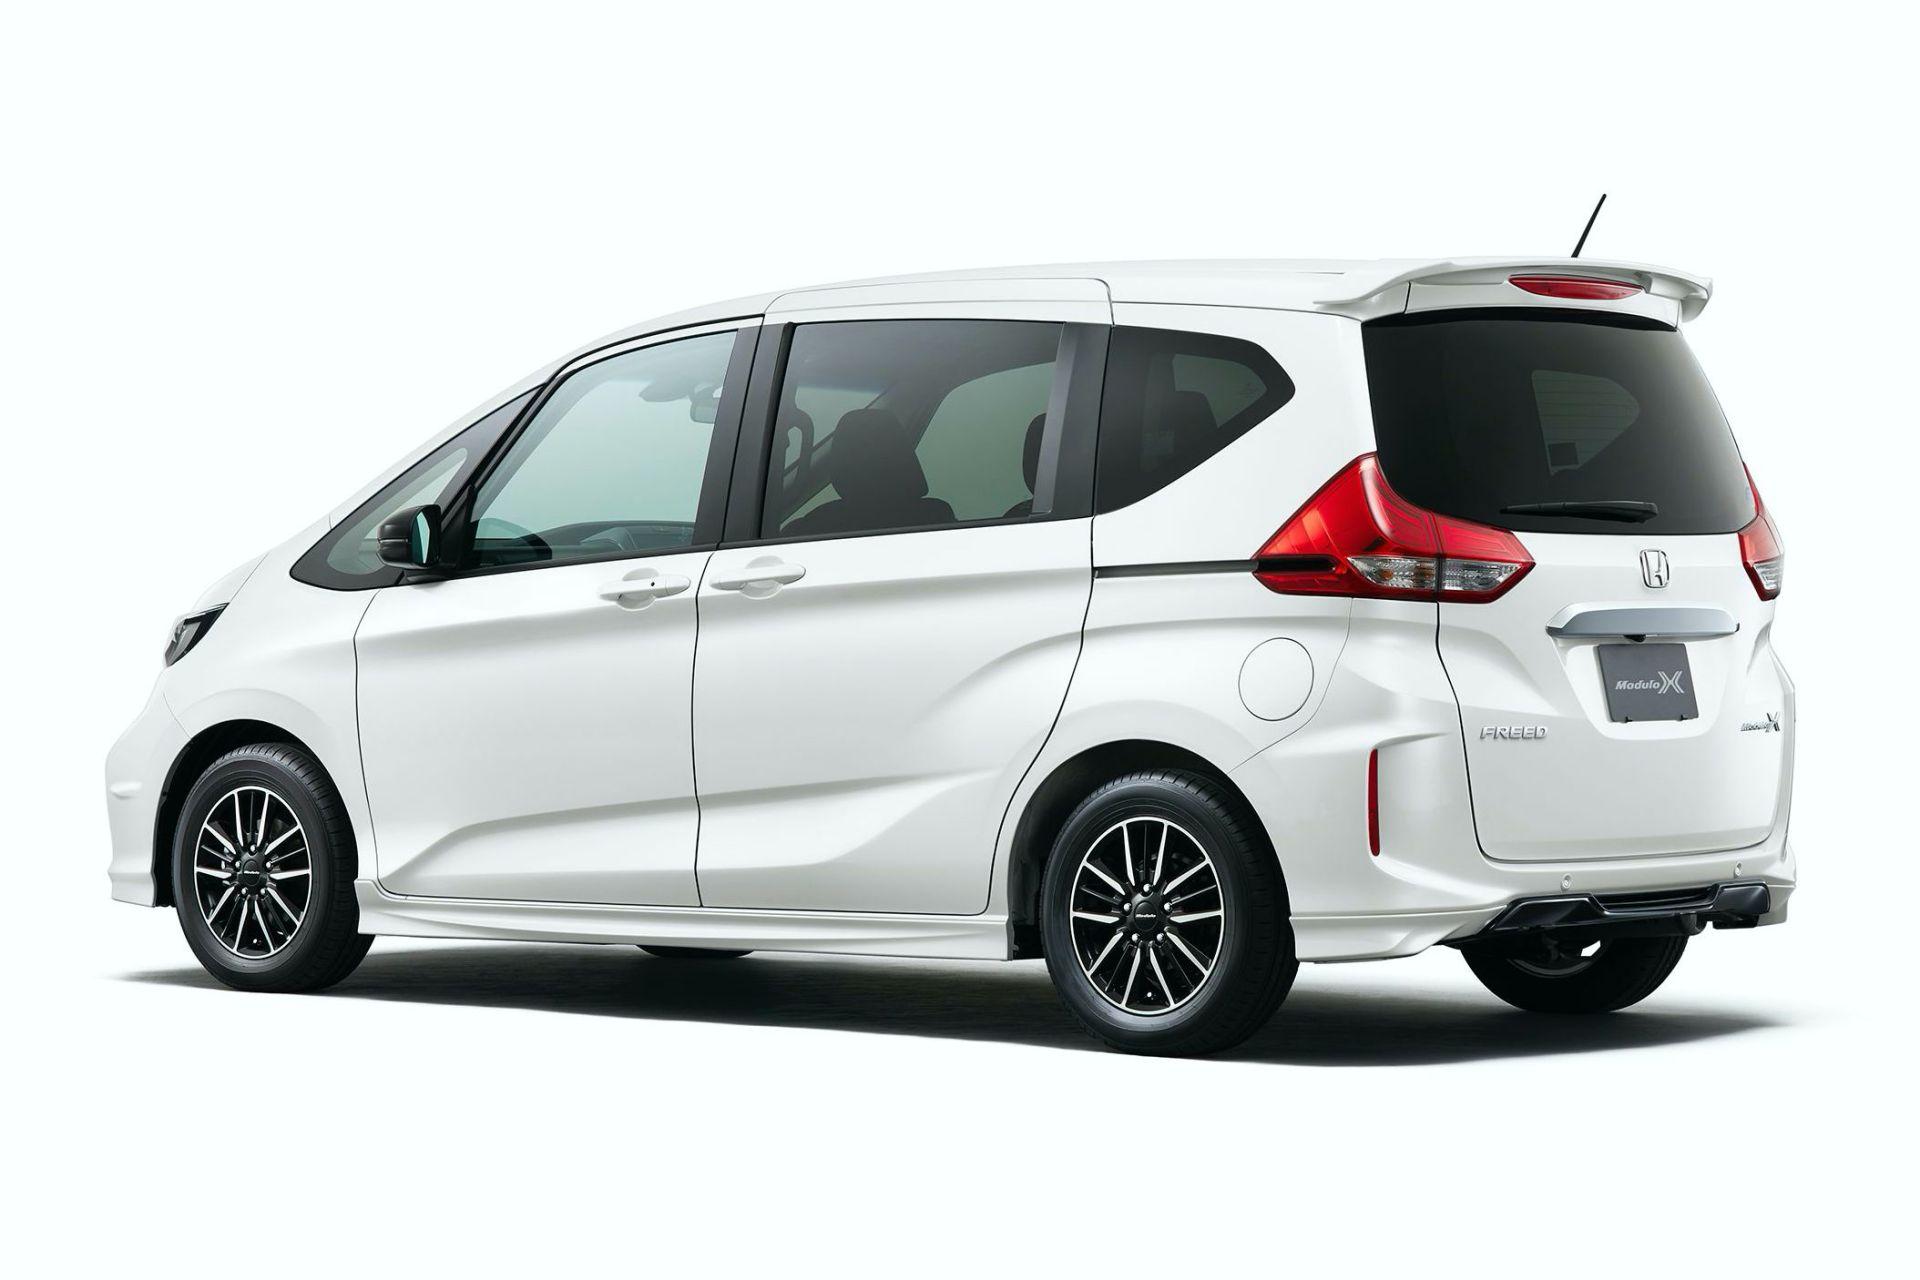 Honda-Freed-Modulo-X-Facelift-2020-35